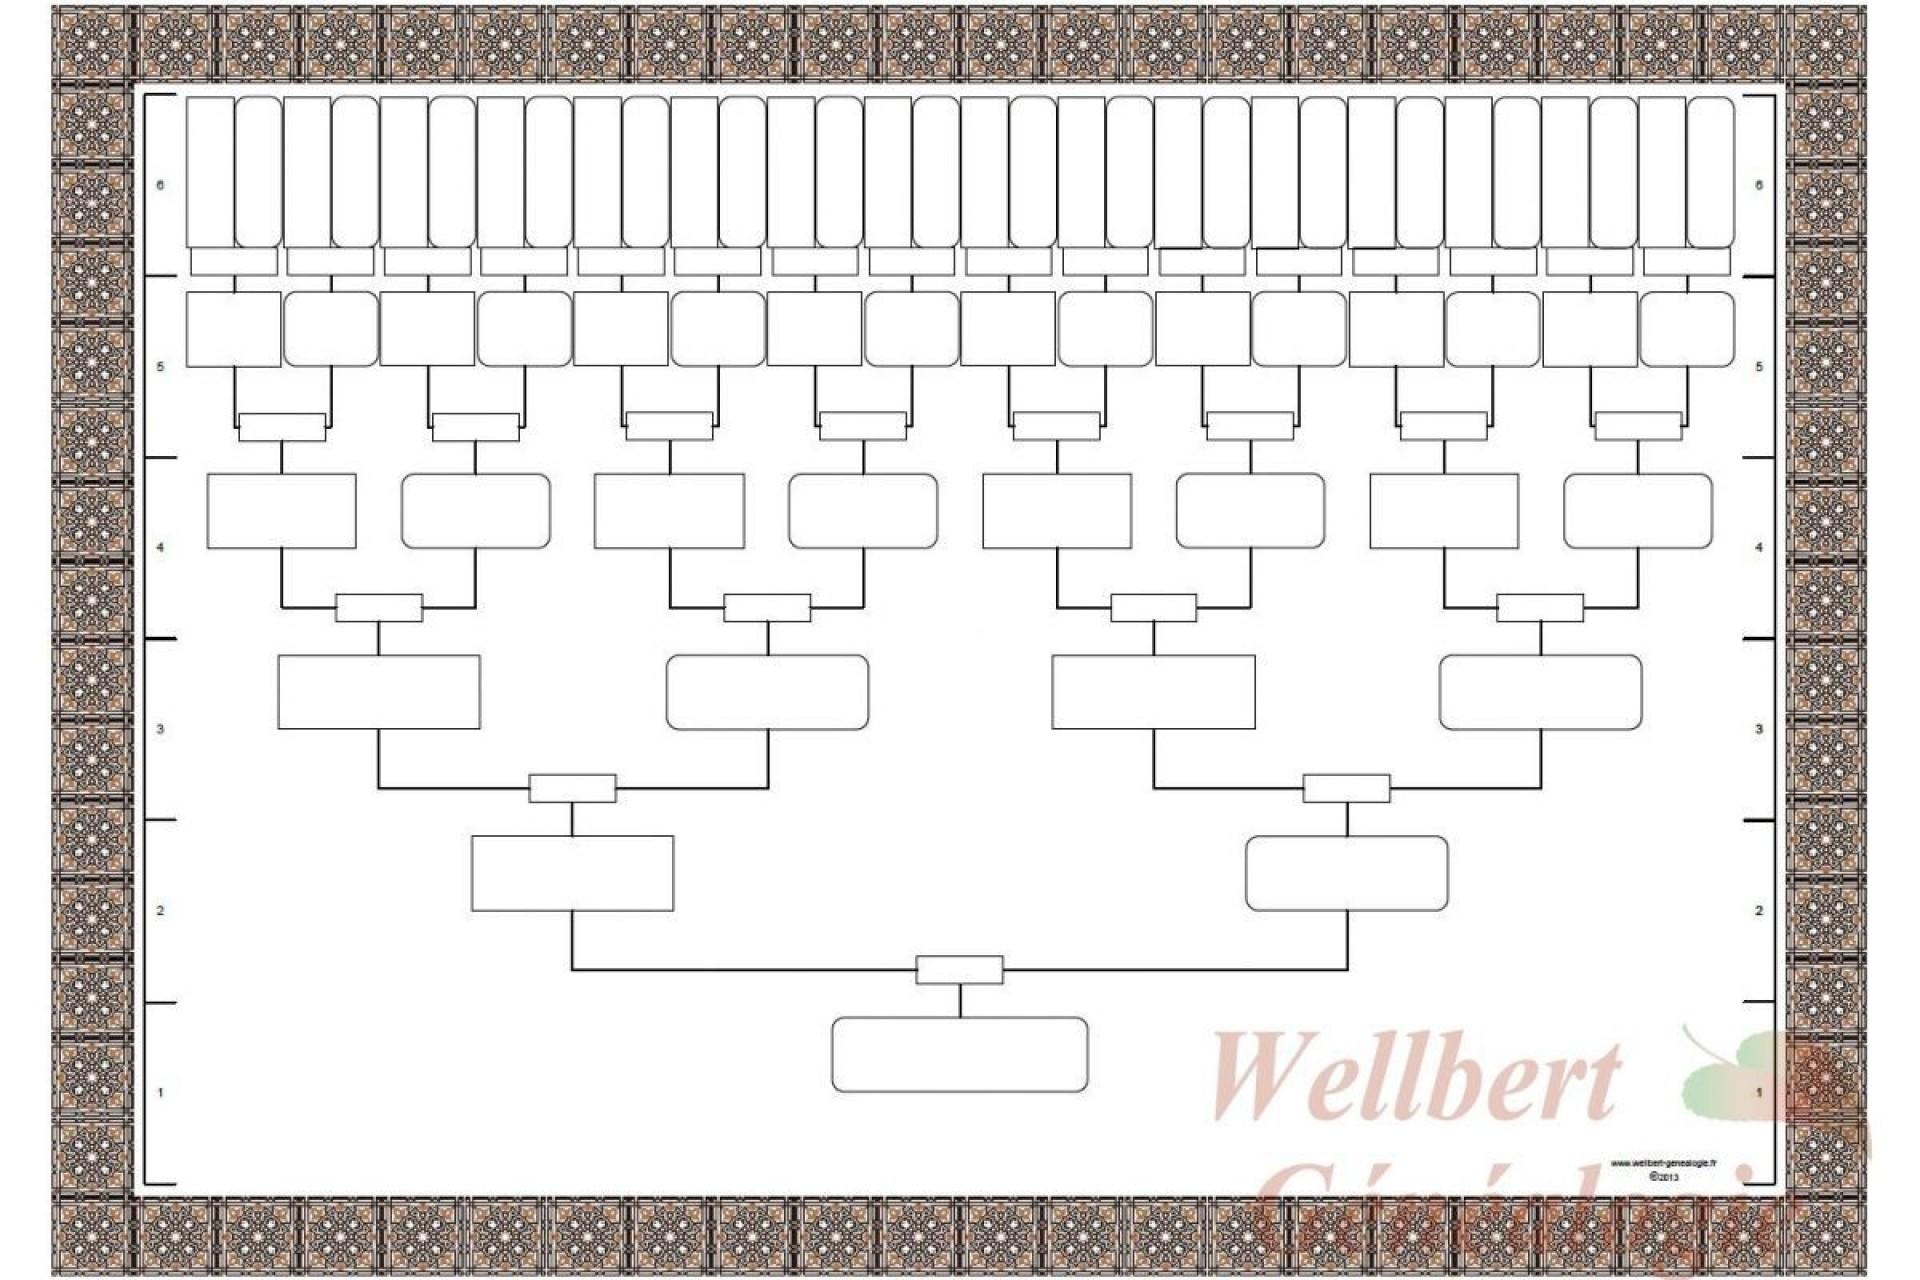 006 Impressive Family Tree Book Template Picture  Photo Free1920